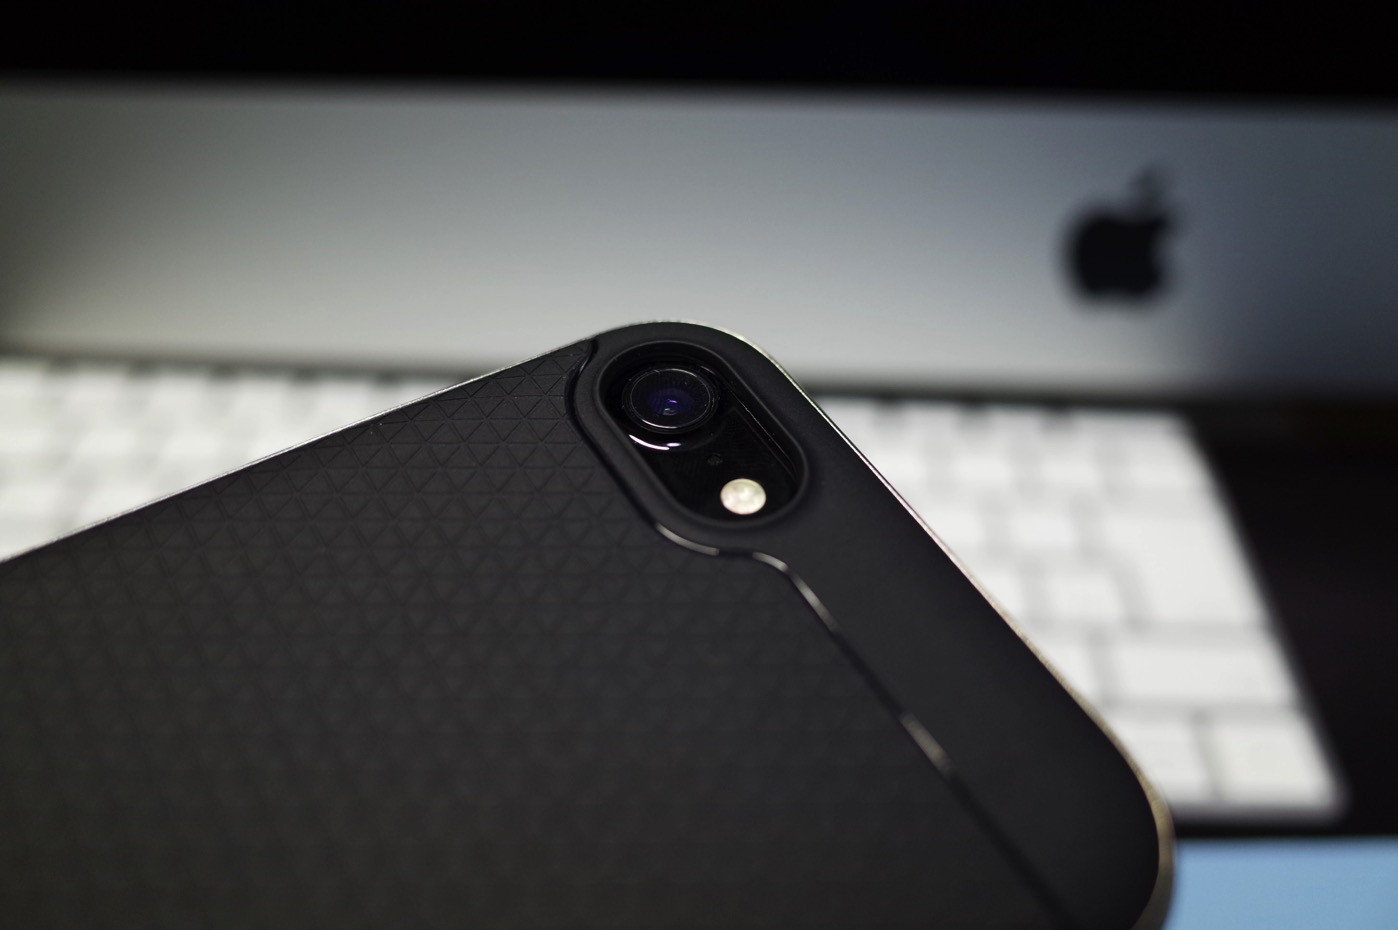 iPhoneケース「ネオ・ハイブリッド米軍MIL規格取得 二重構造バンパー」-13